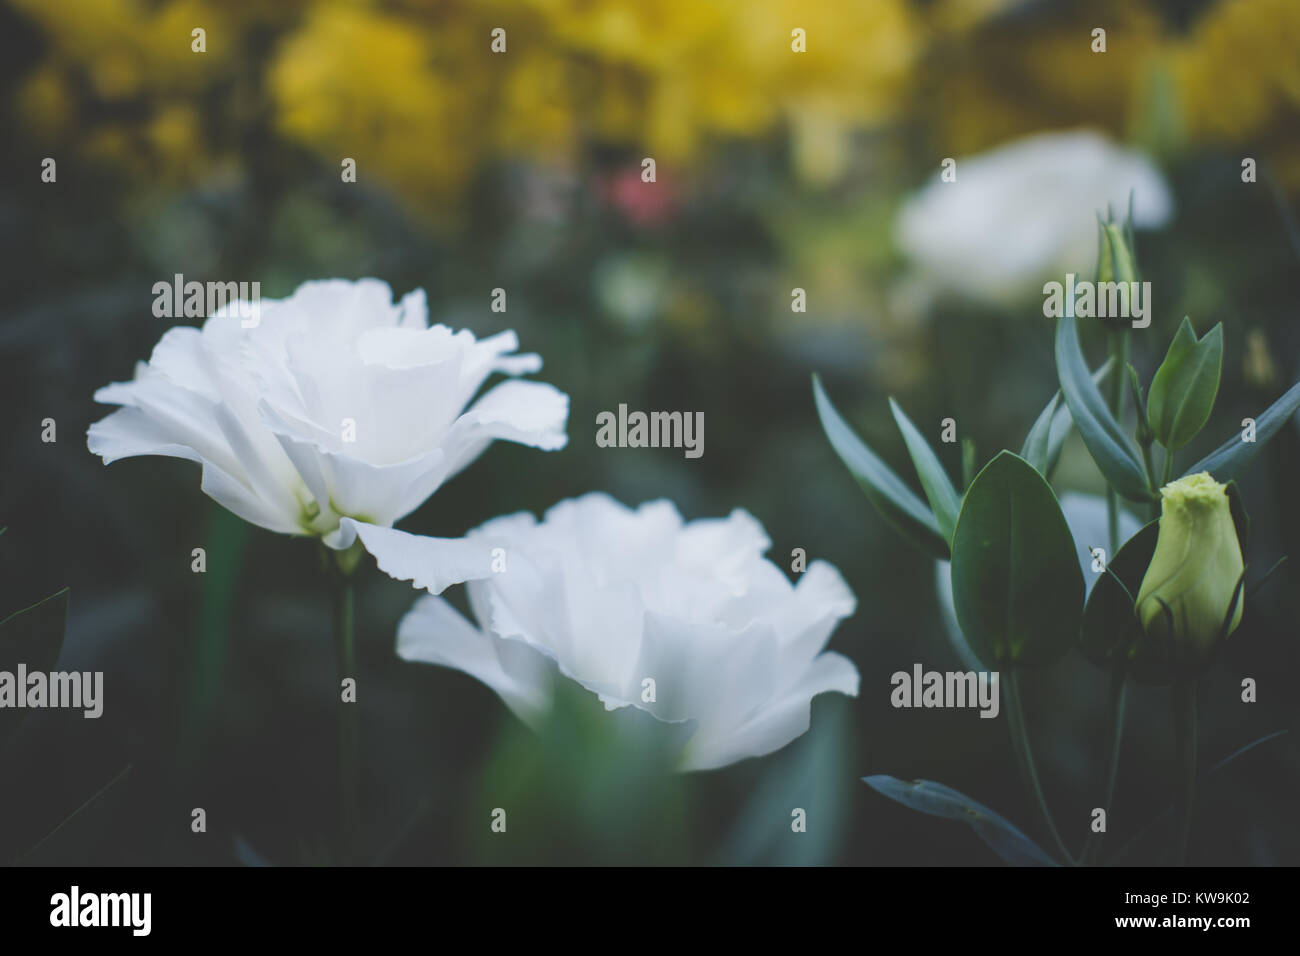 white lisianthus. texas blue bell. tulip gentian. blooming flower in garden. eustoma flora in park. - Stock Image